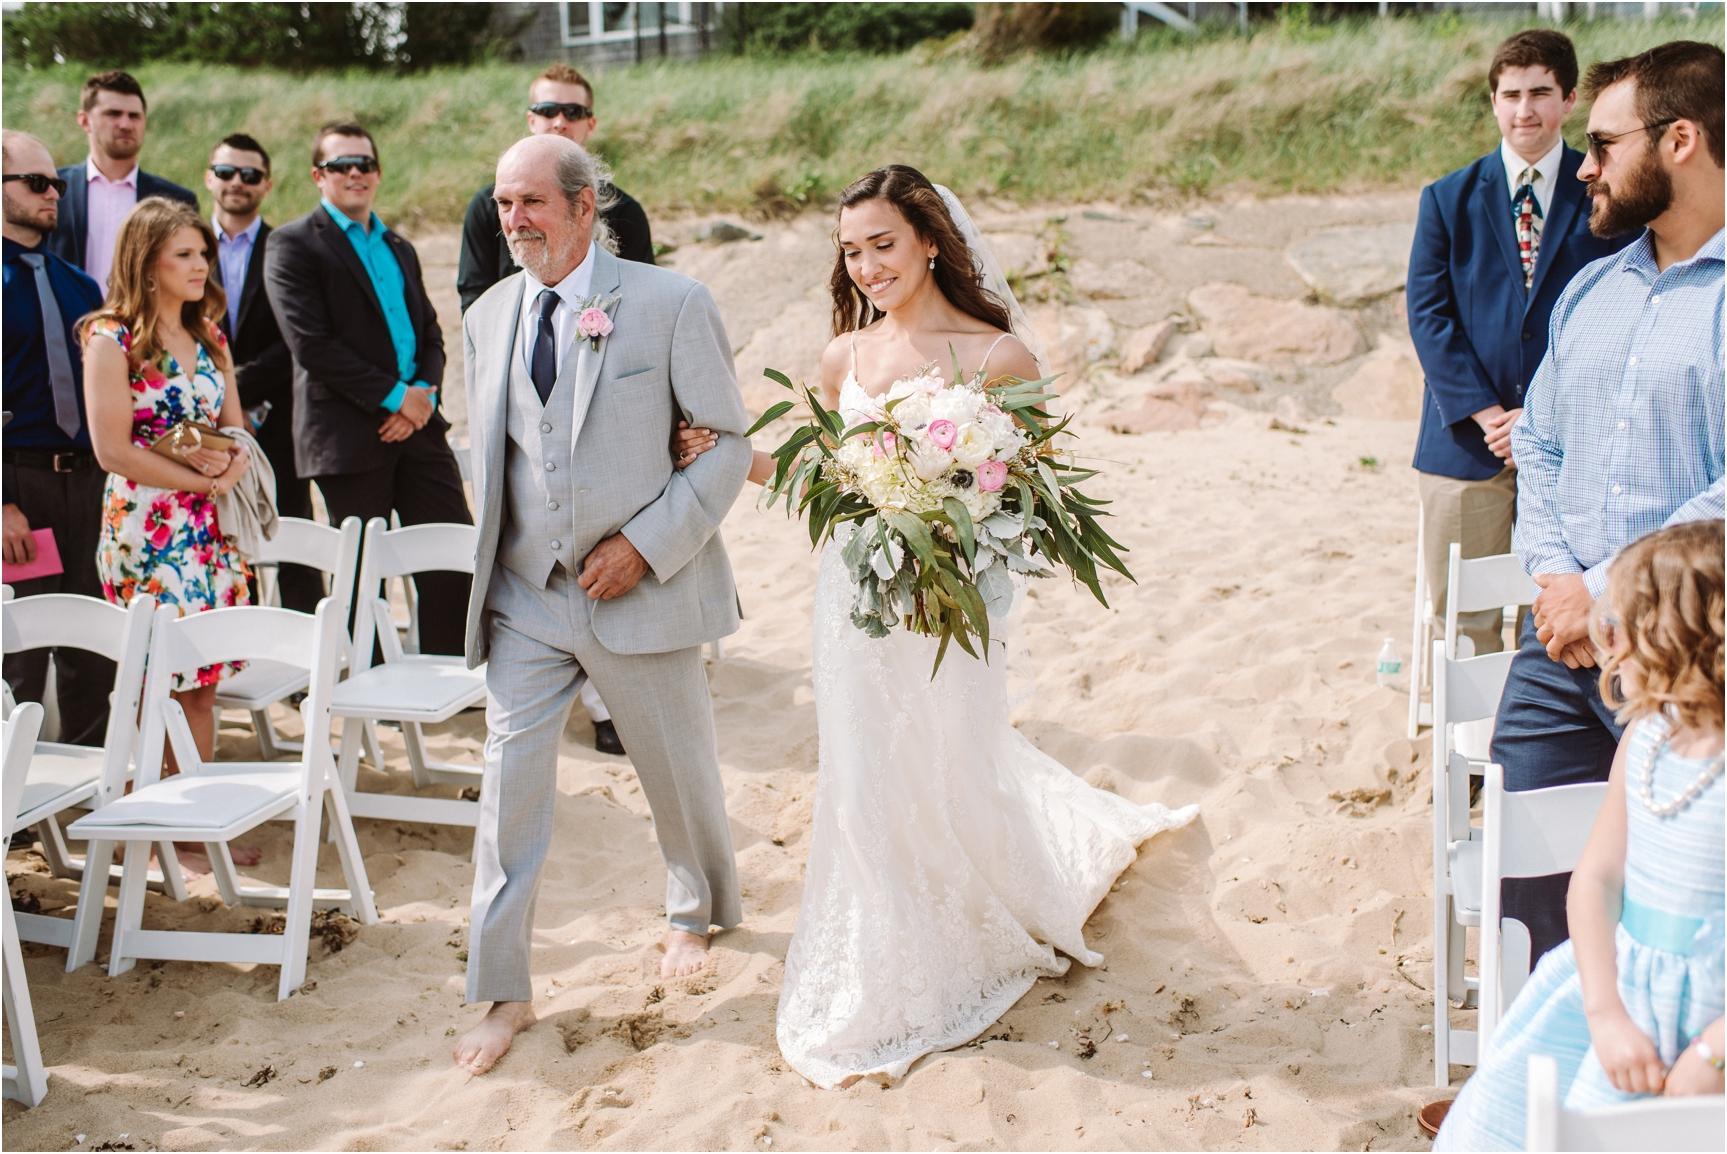 Sarah & Sam Pelham House Cape Cod Wedding Photographer-90.jpg